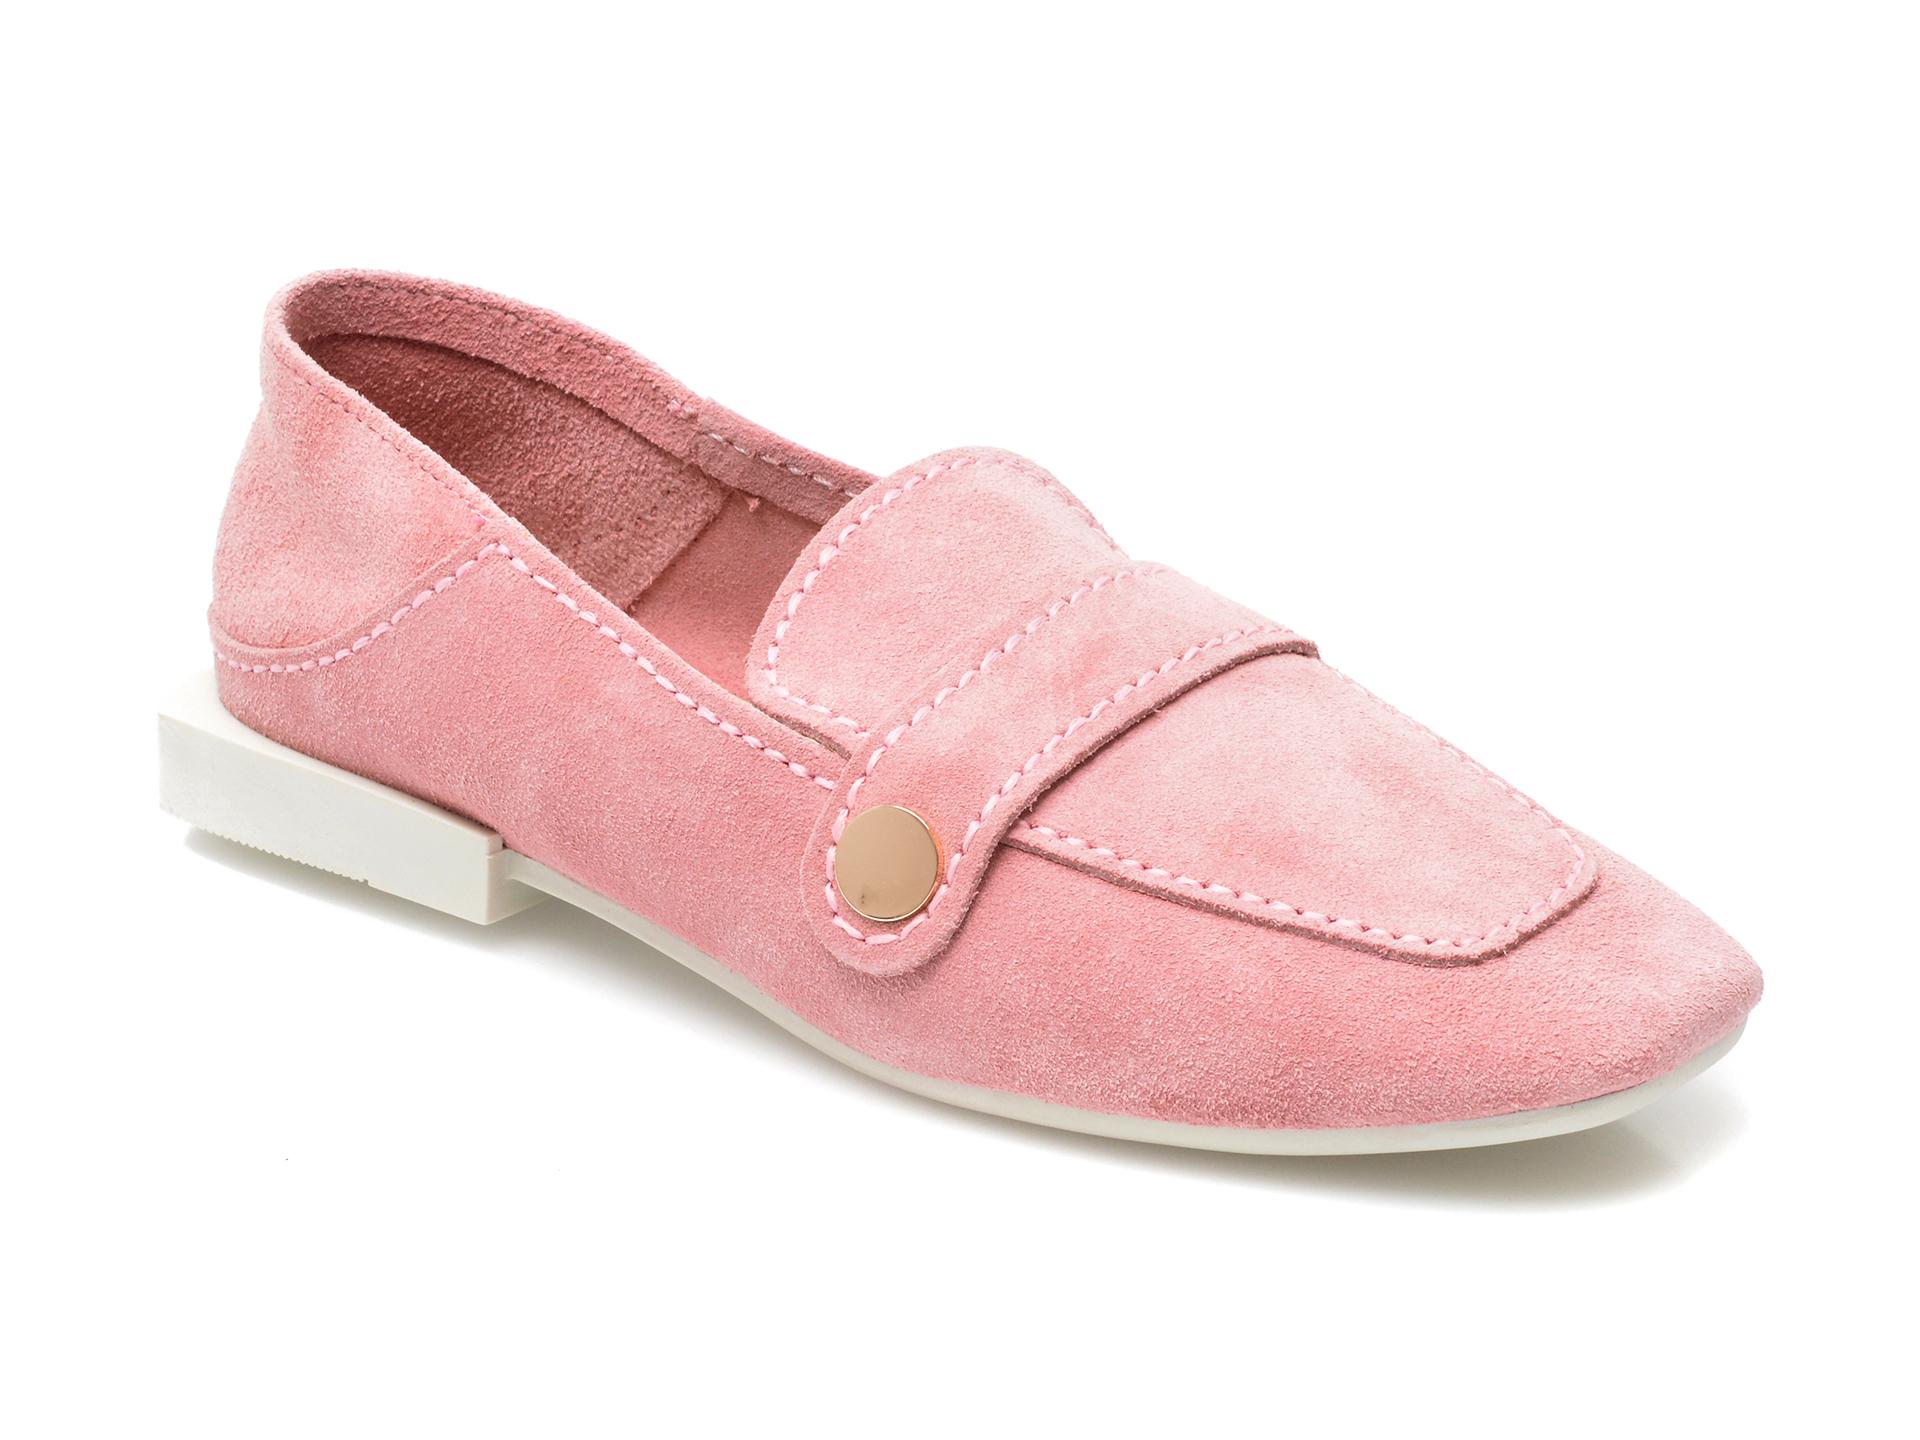 Pantofi IMAGE roz, 205101, din piele intoarsa imagine otter.ro 2021